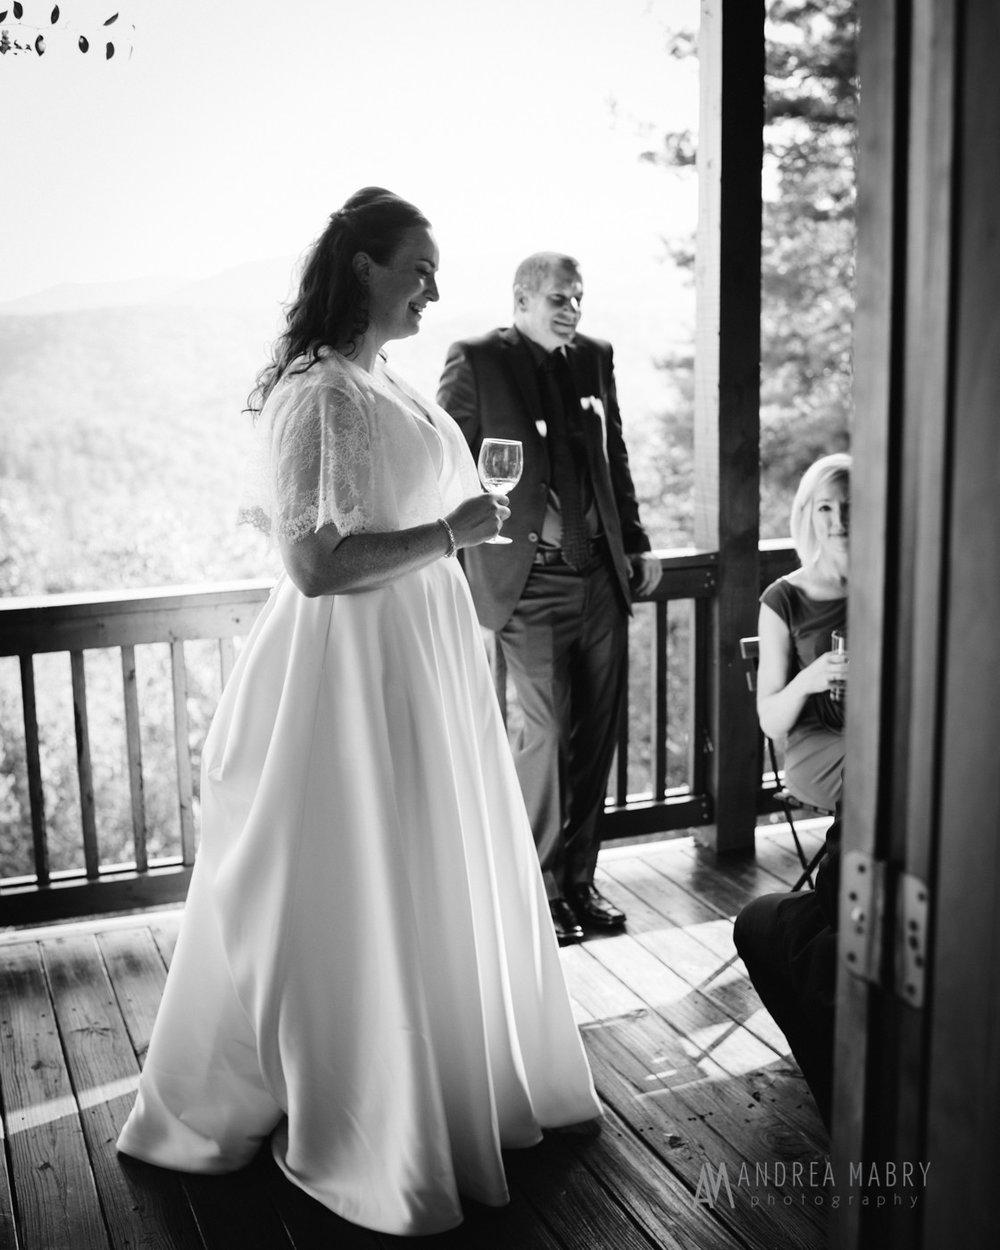 scott-wed-blog-mabry-036-8658-2.jpg